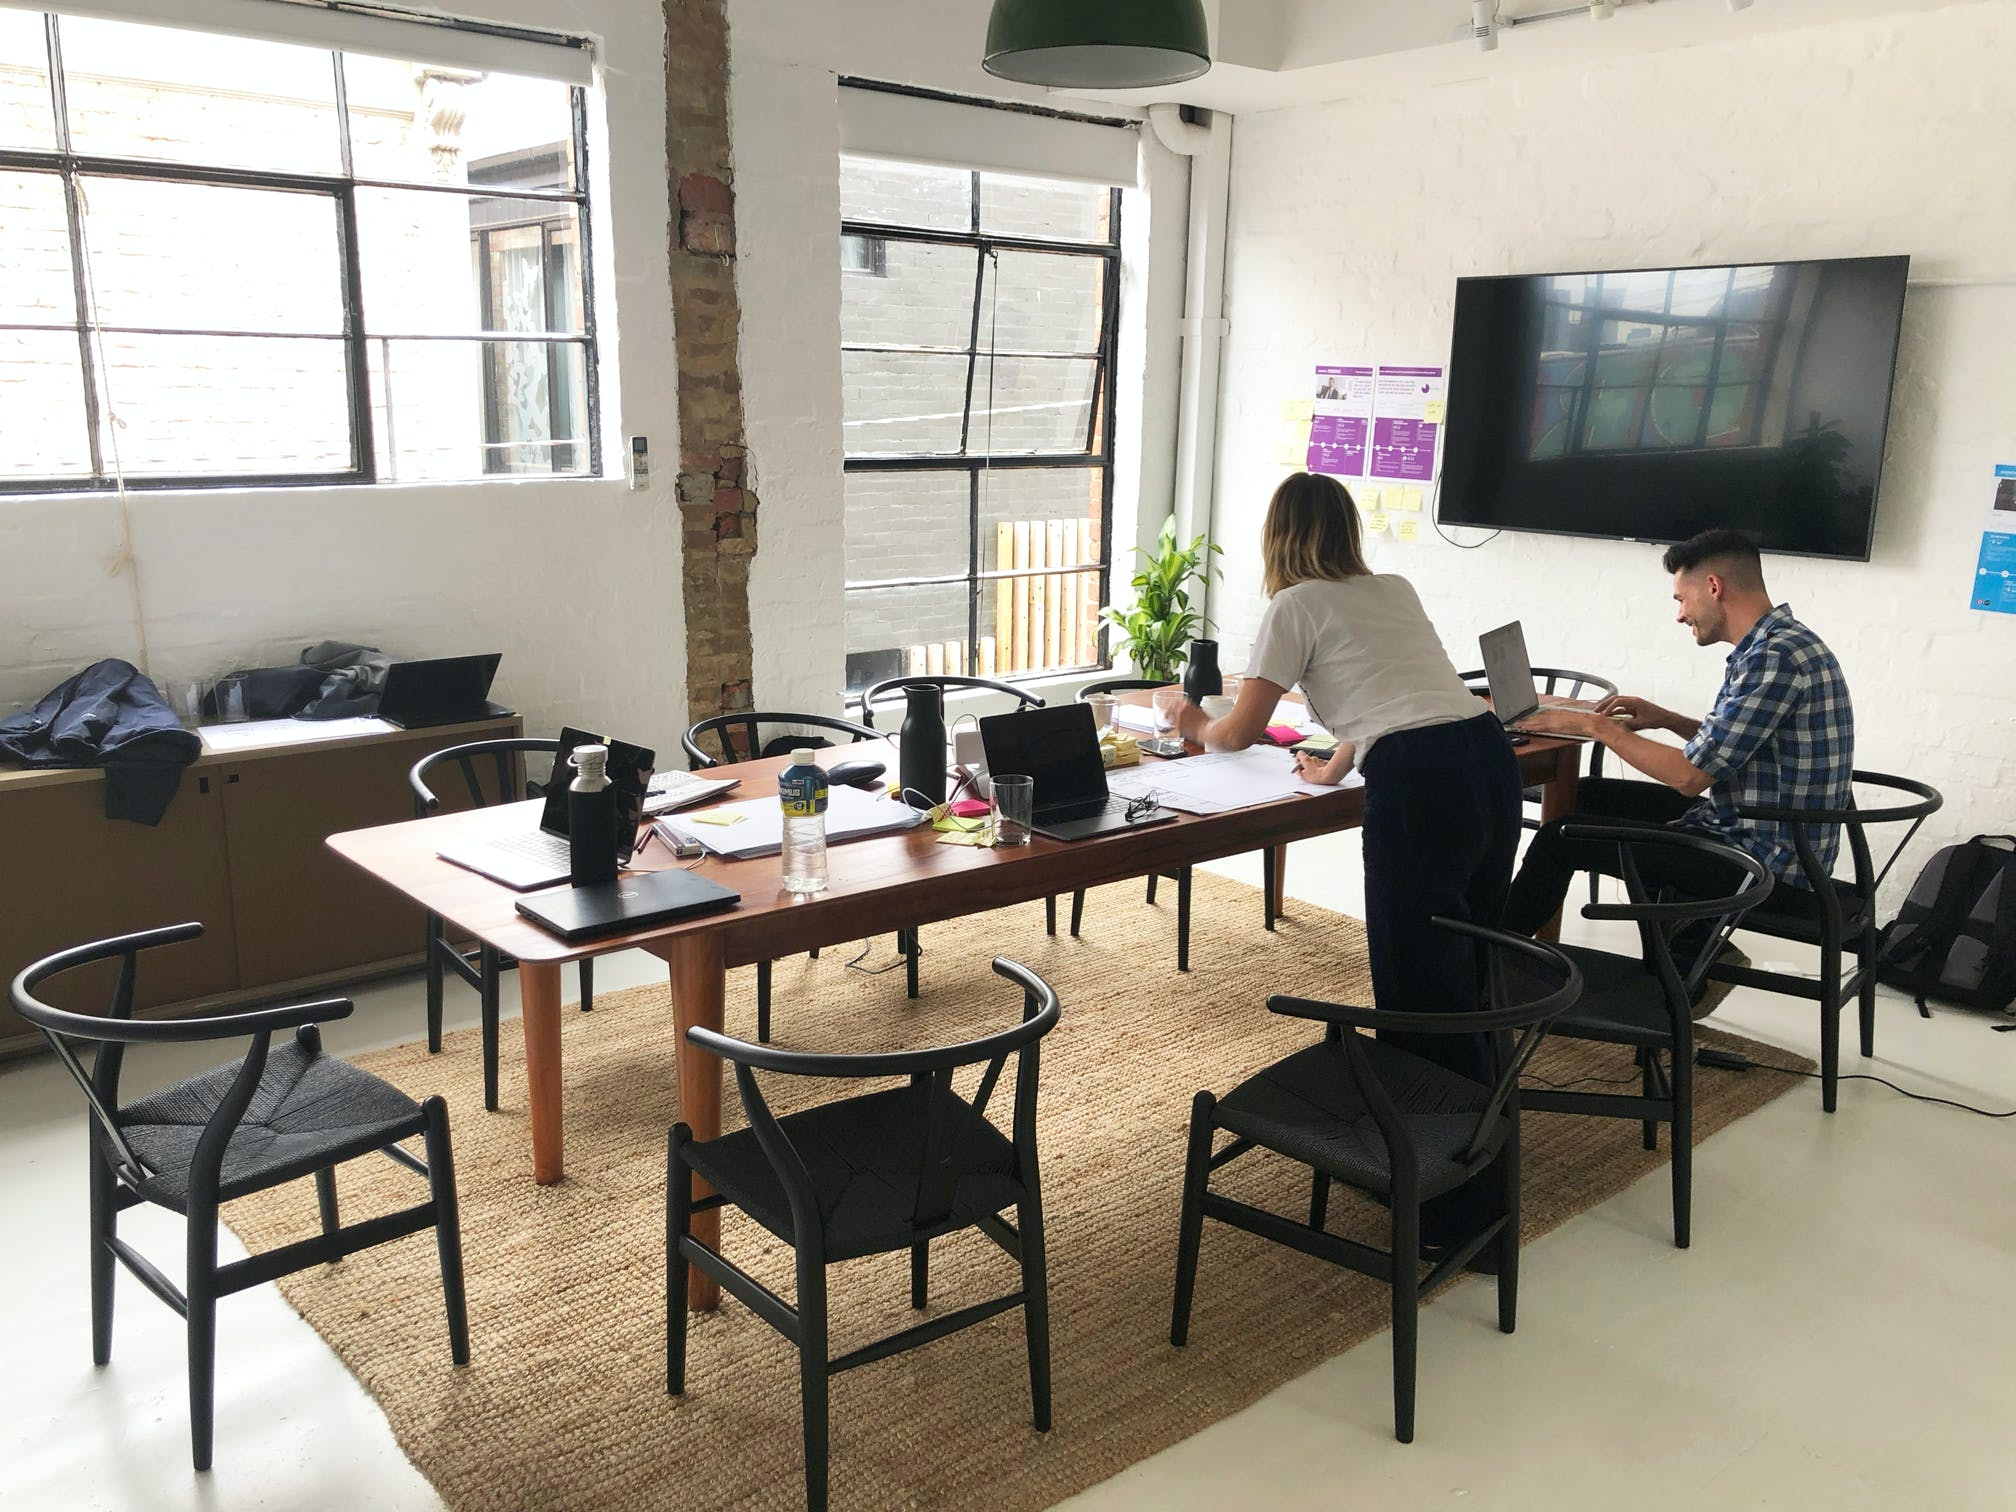 Board Room / Design Sprint Space, meeting room at Neighbourhood - 397 Brunswick Street, image 3